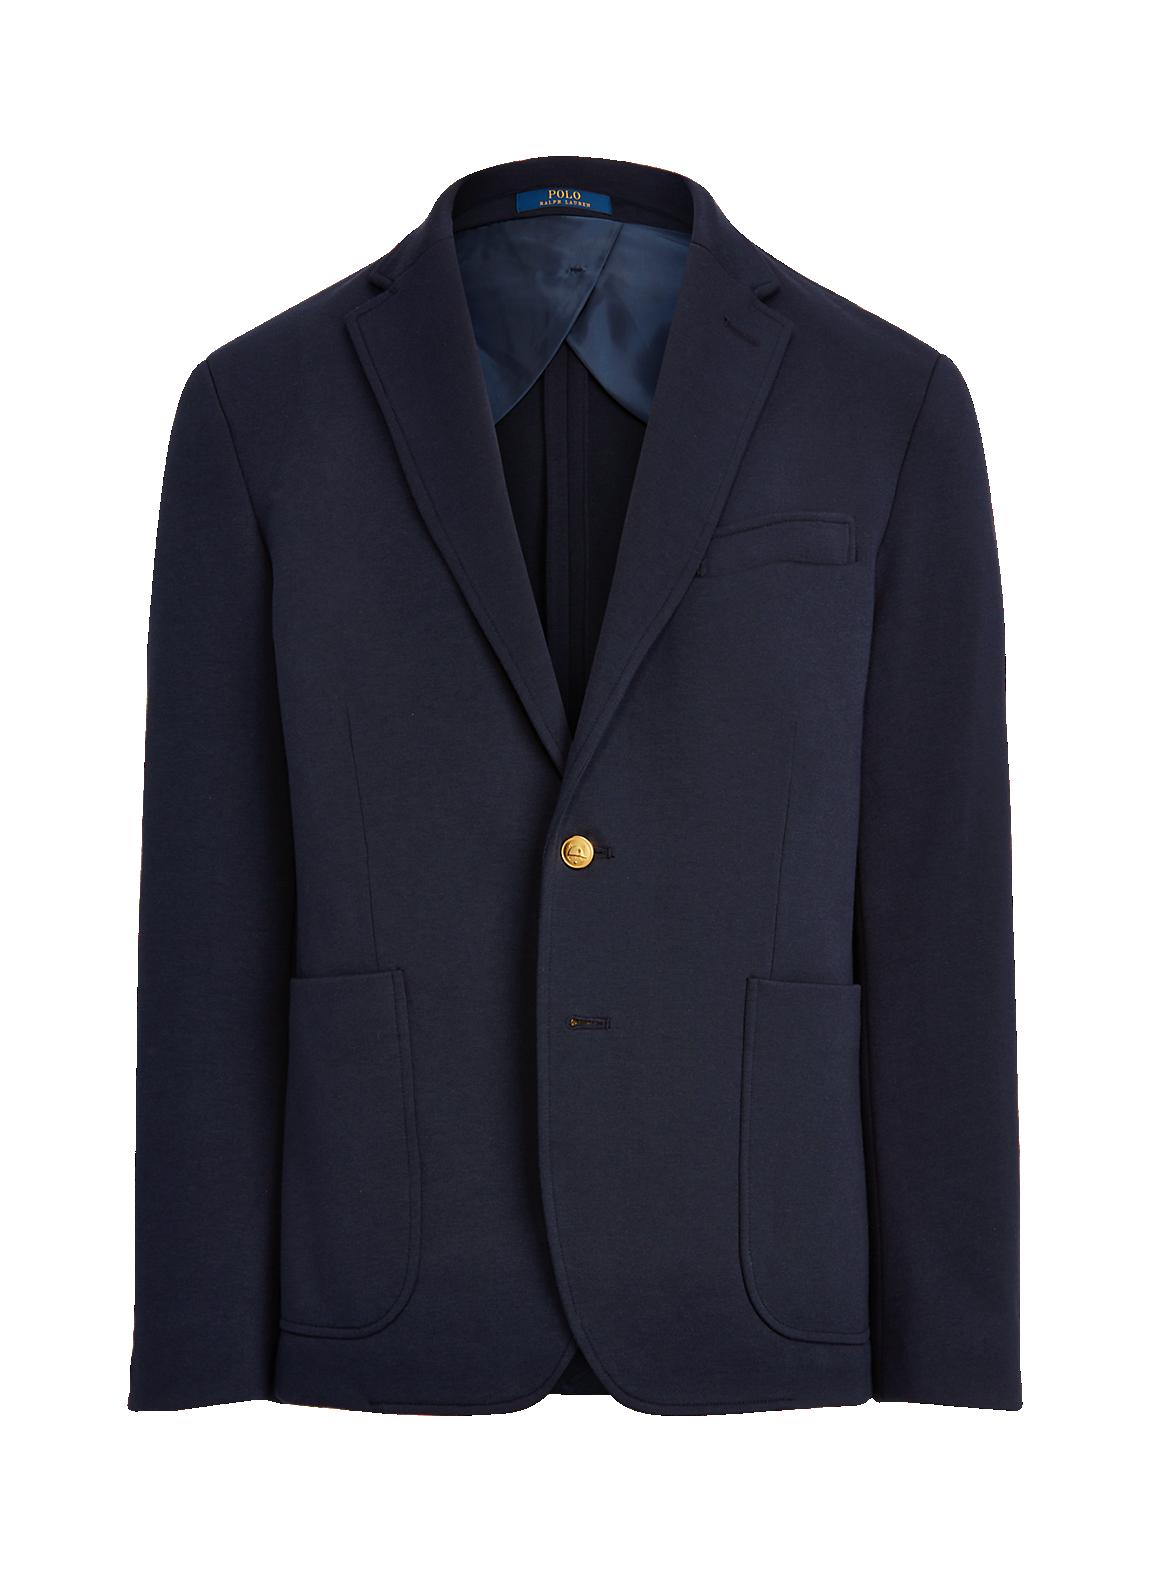 Polo ソフト ニット スーツ ジャケット